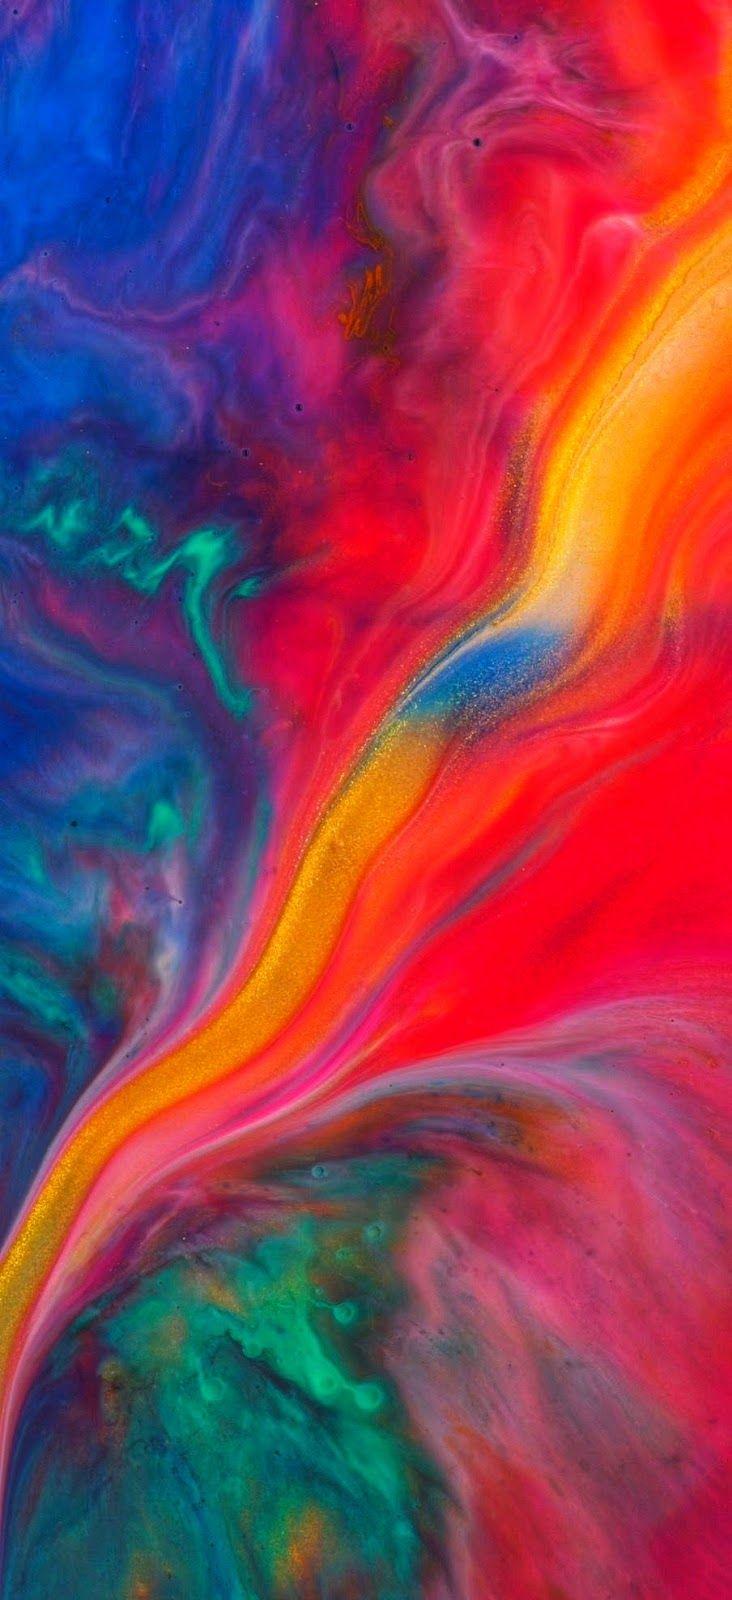 Colorful Wallpaper Wallpaper iphone ios7, Ios 11